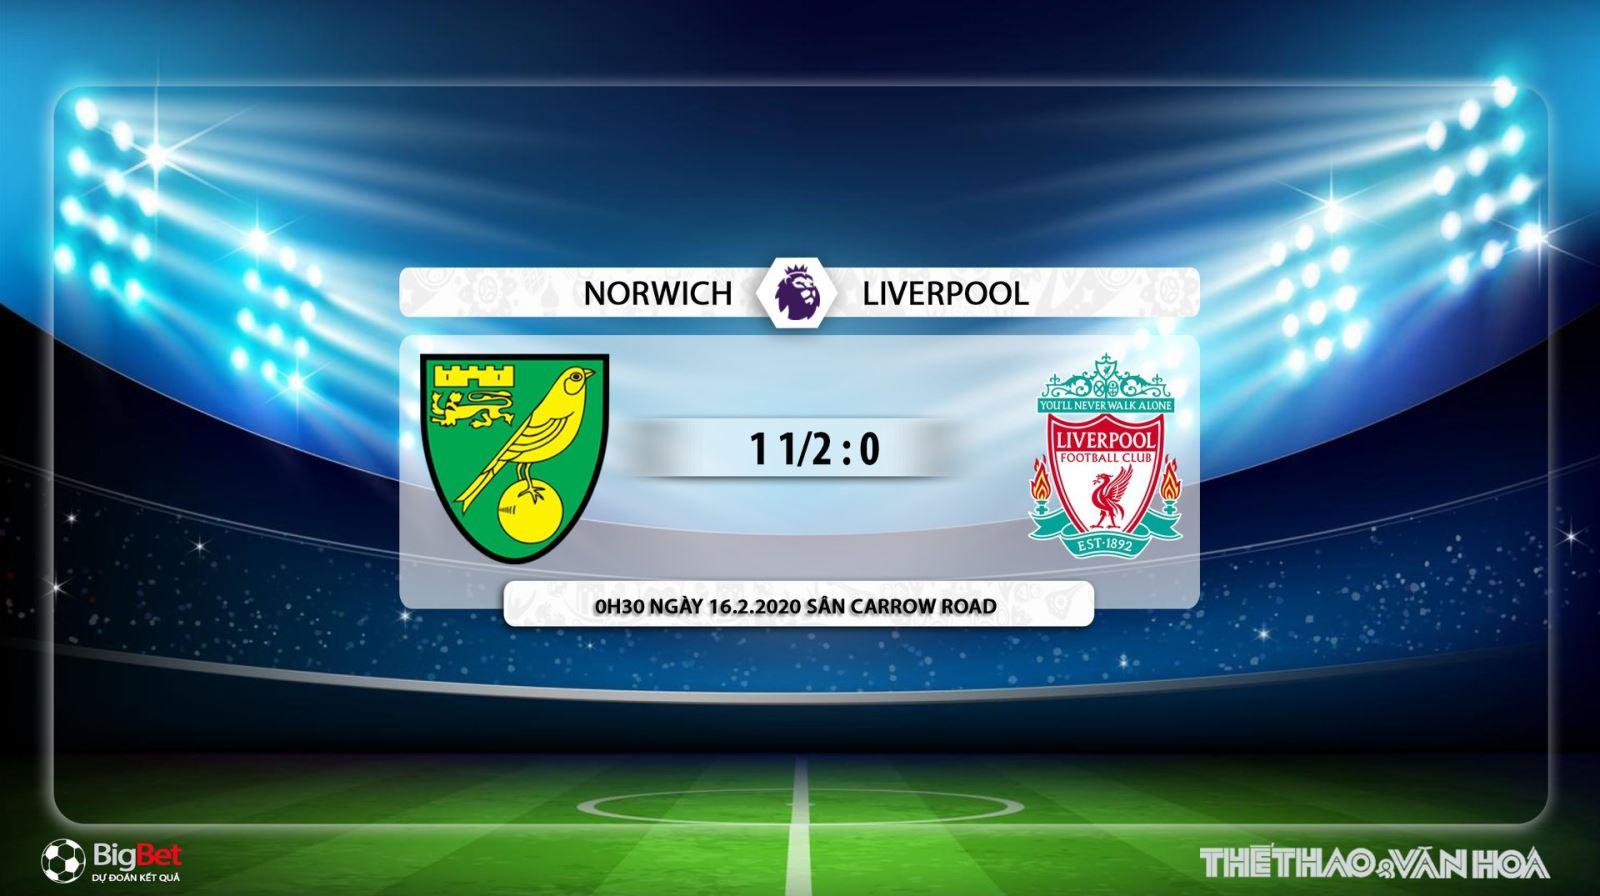 Norwich vs Liverpool, norwich, liverpool, trực tiếp Norwich vs Liverpool, bóng đá, bong da, K+, K+PM, lịch thi đấu